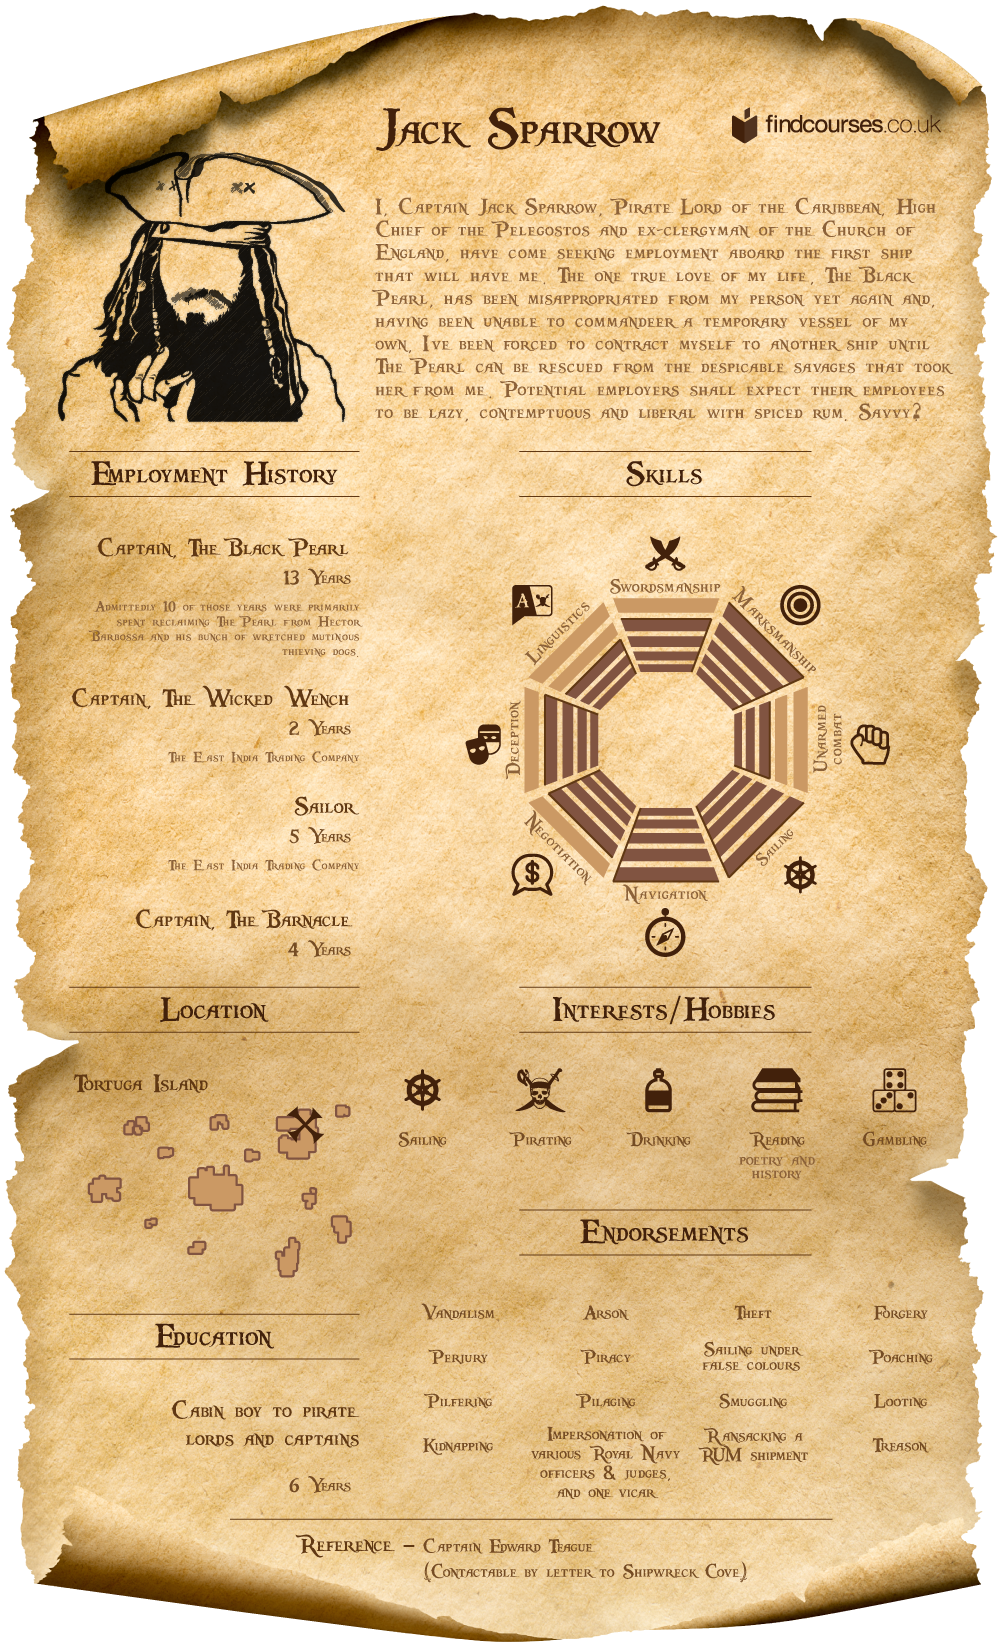 Jack-Sparrow.png